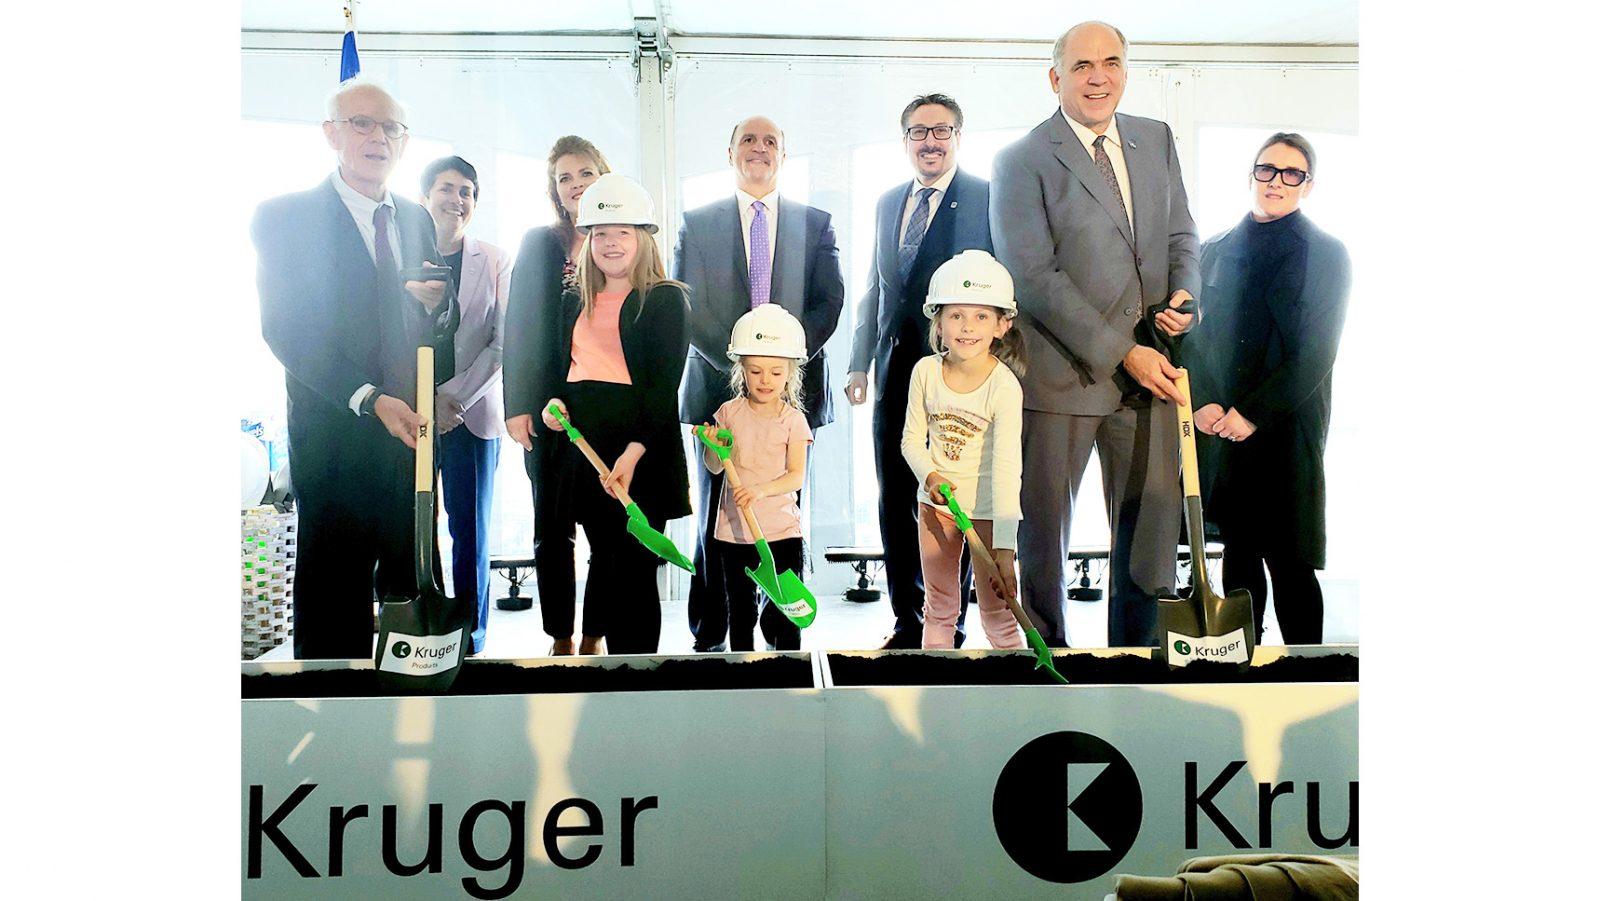 Kruger breaks ground on new factory in Brompton